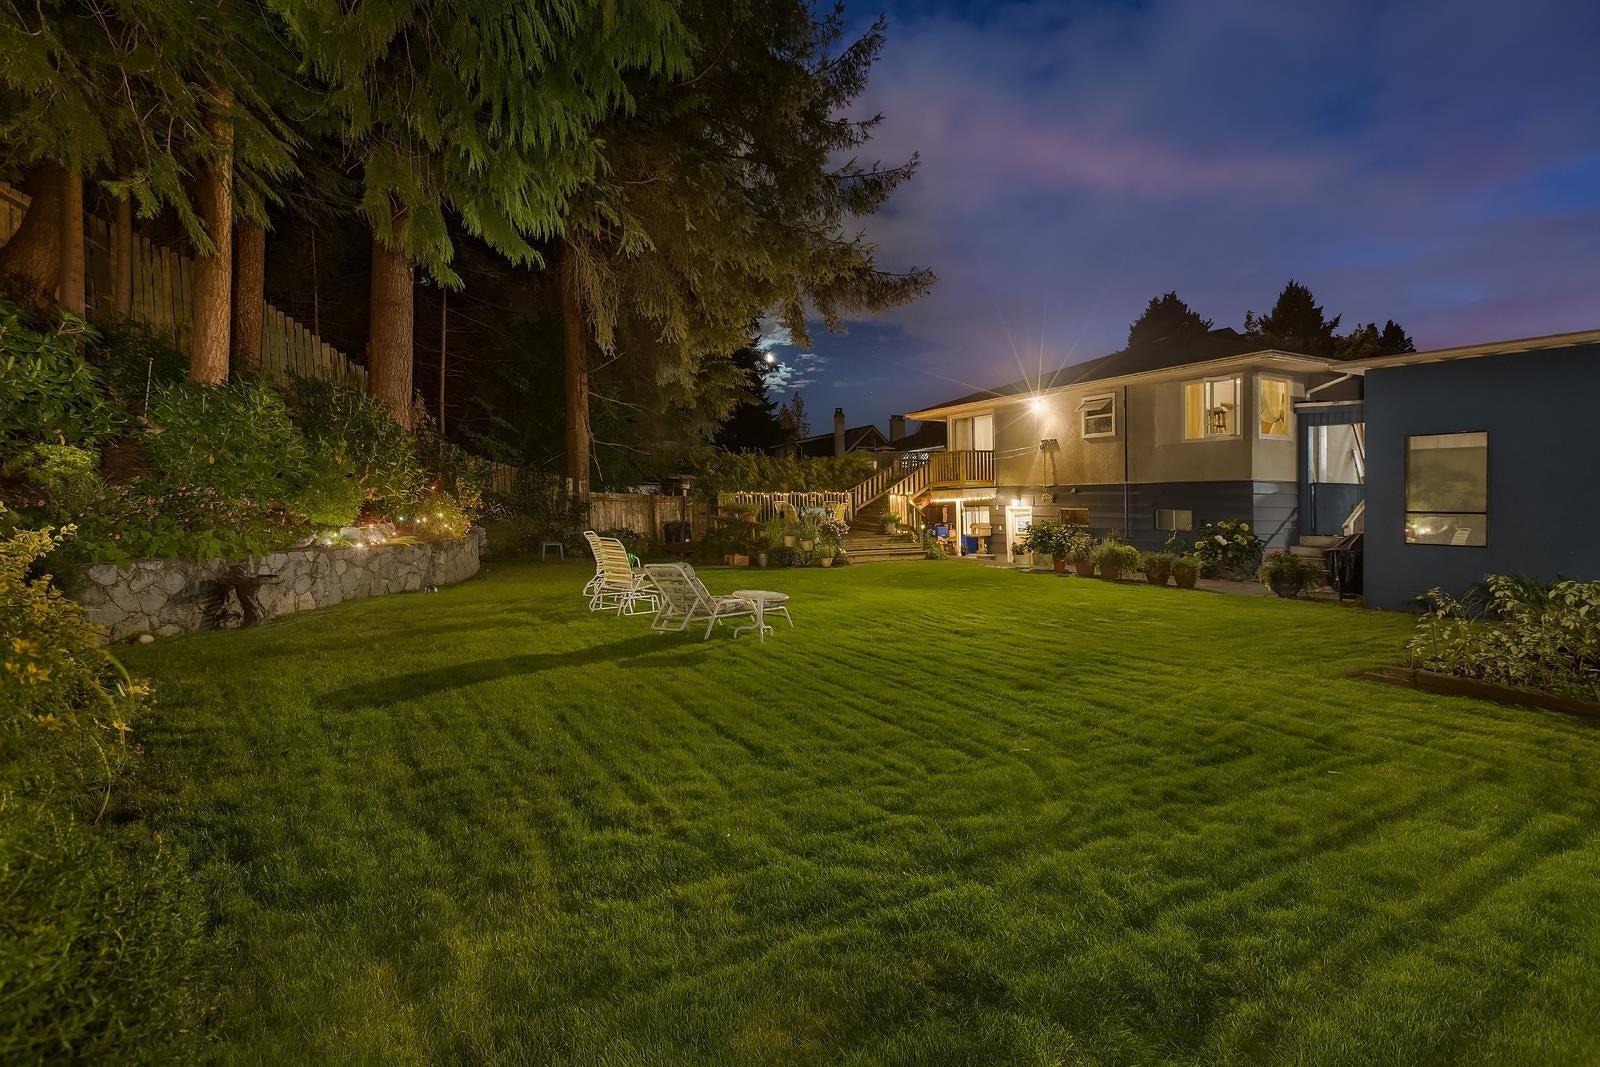 3495 WELLINGTON CRESCENT - Edgemont House/Single Family for sale, 3 Bedrooms (R2617949) - #18